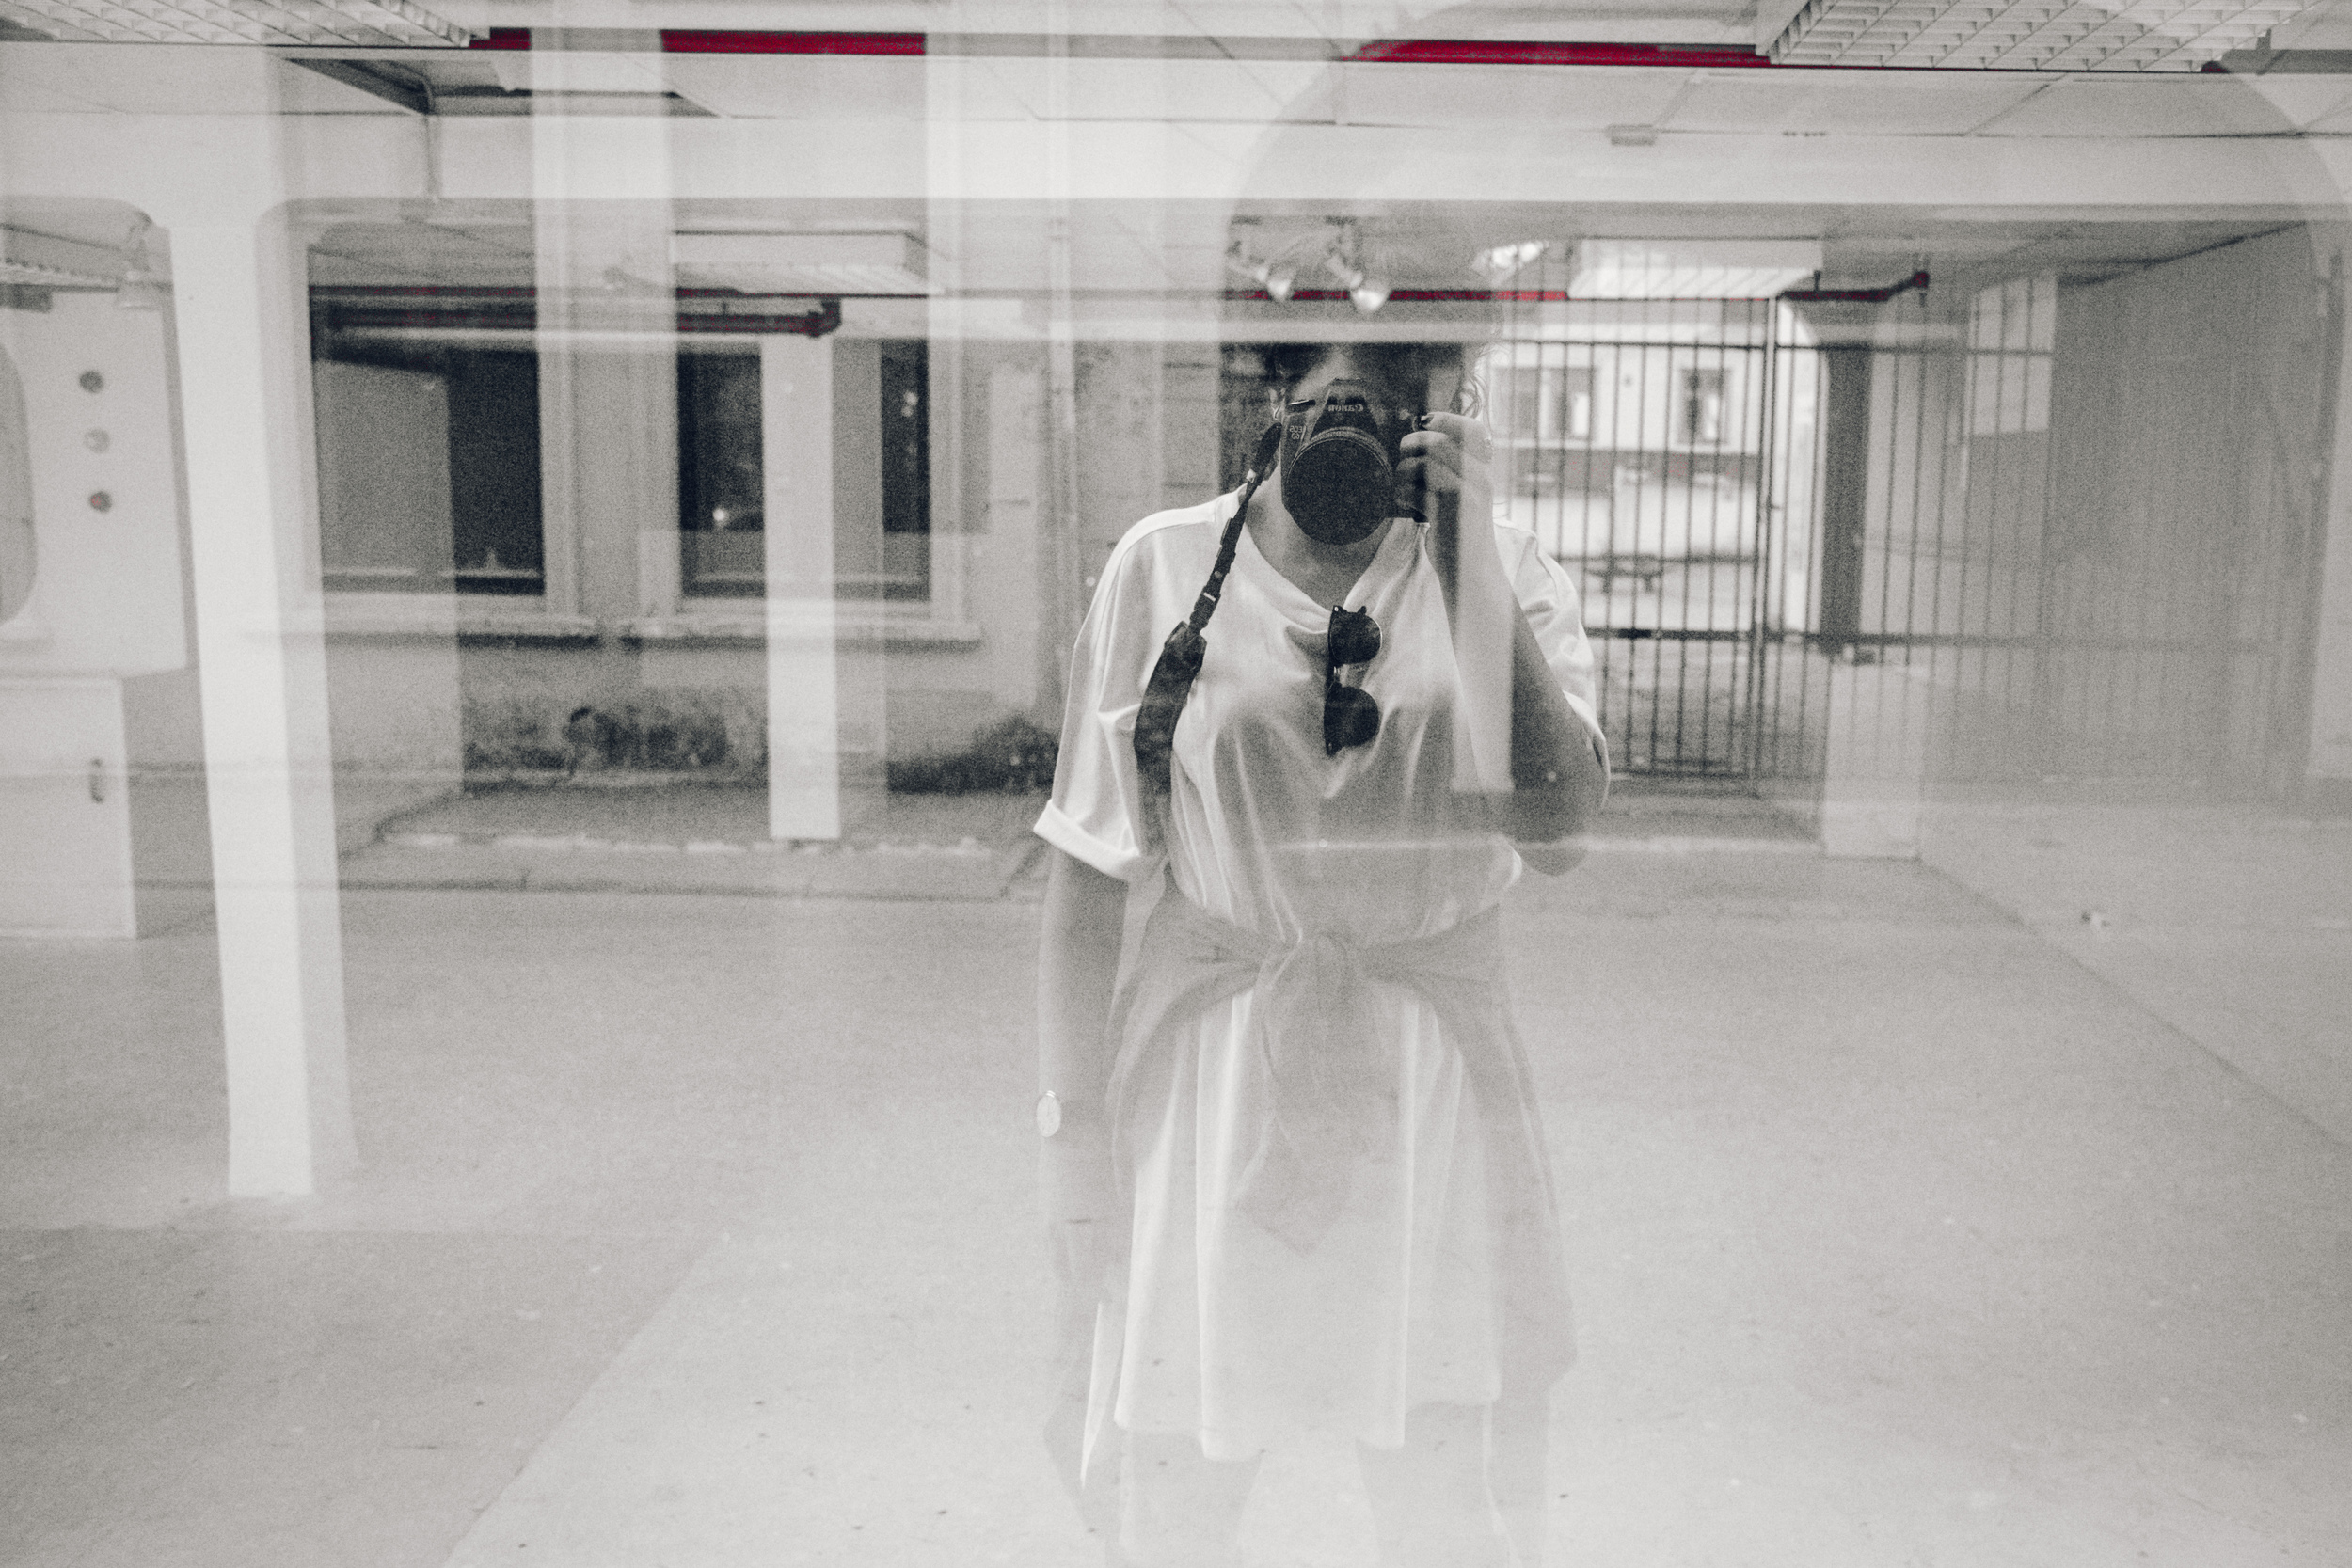 Reflection-5358.jpg